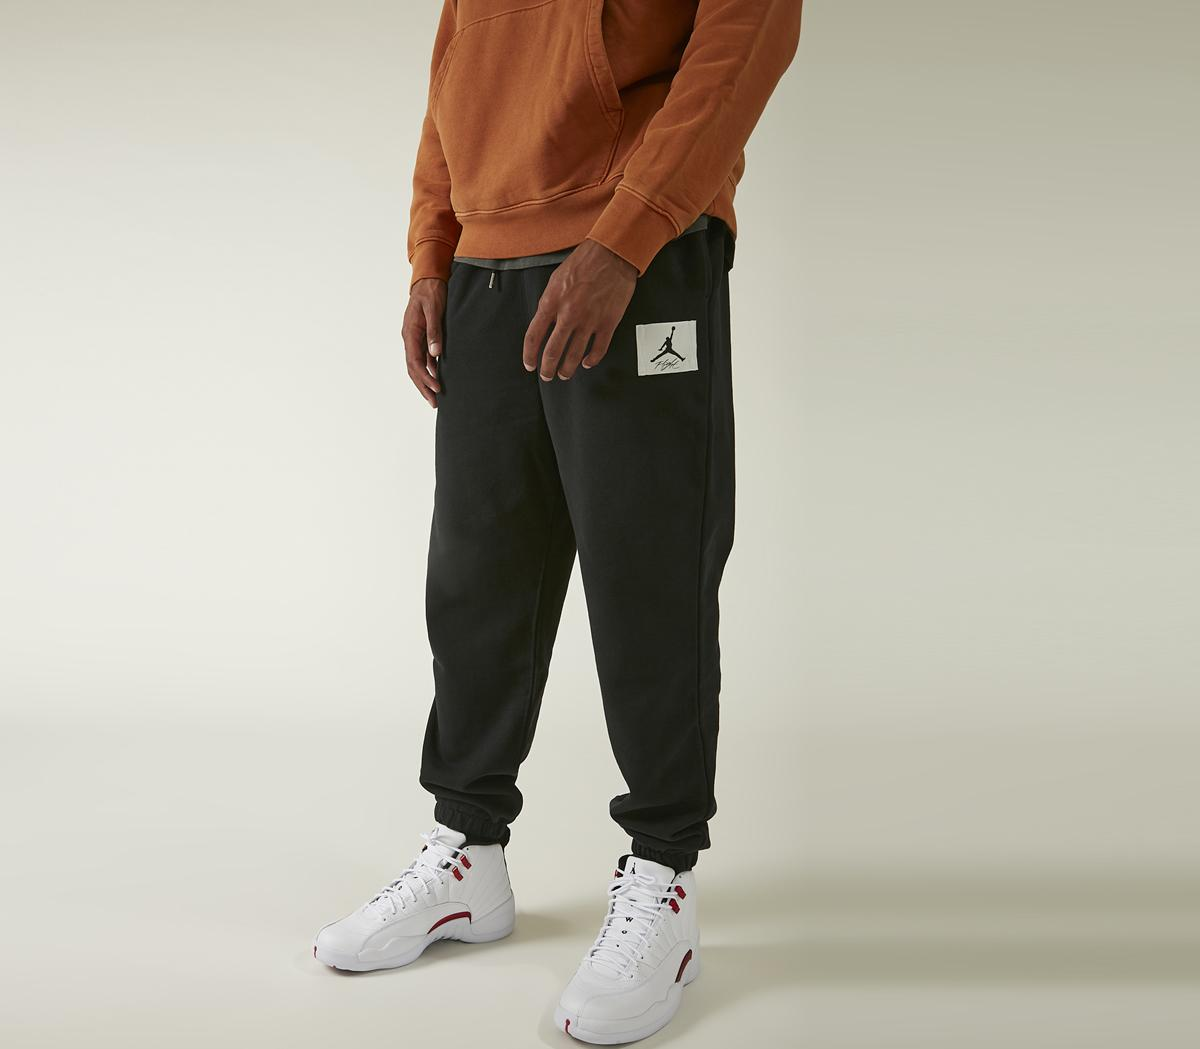 MJ Essential Statement Fleece Pant